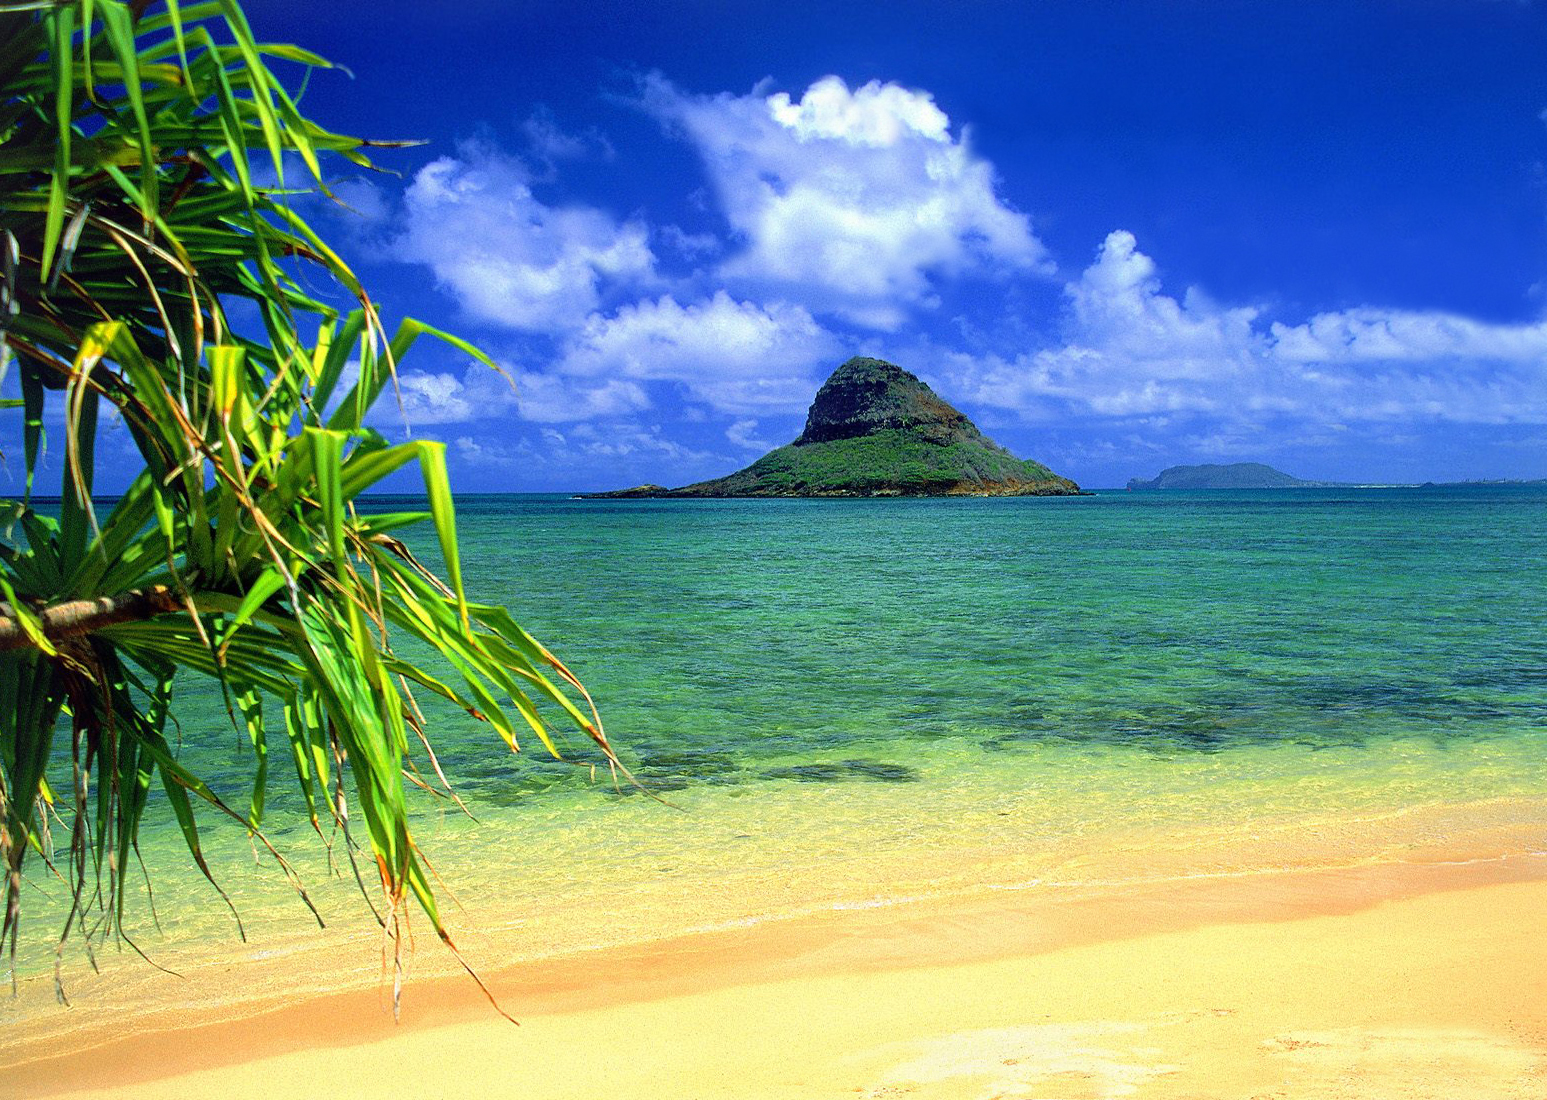 Hawaii paradise on earth Kizie blog 1547x1100